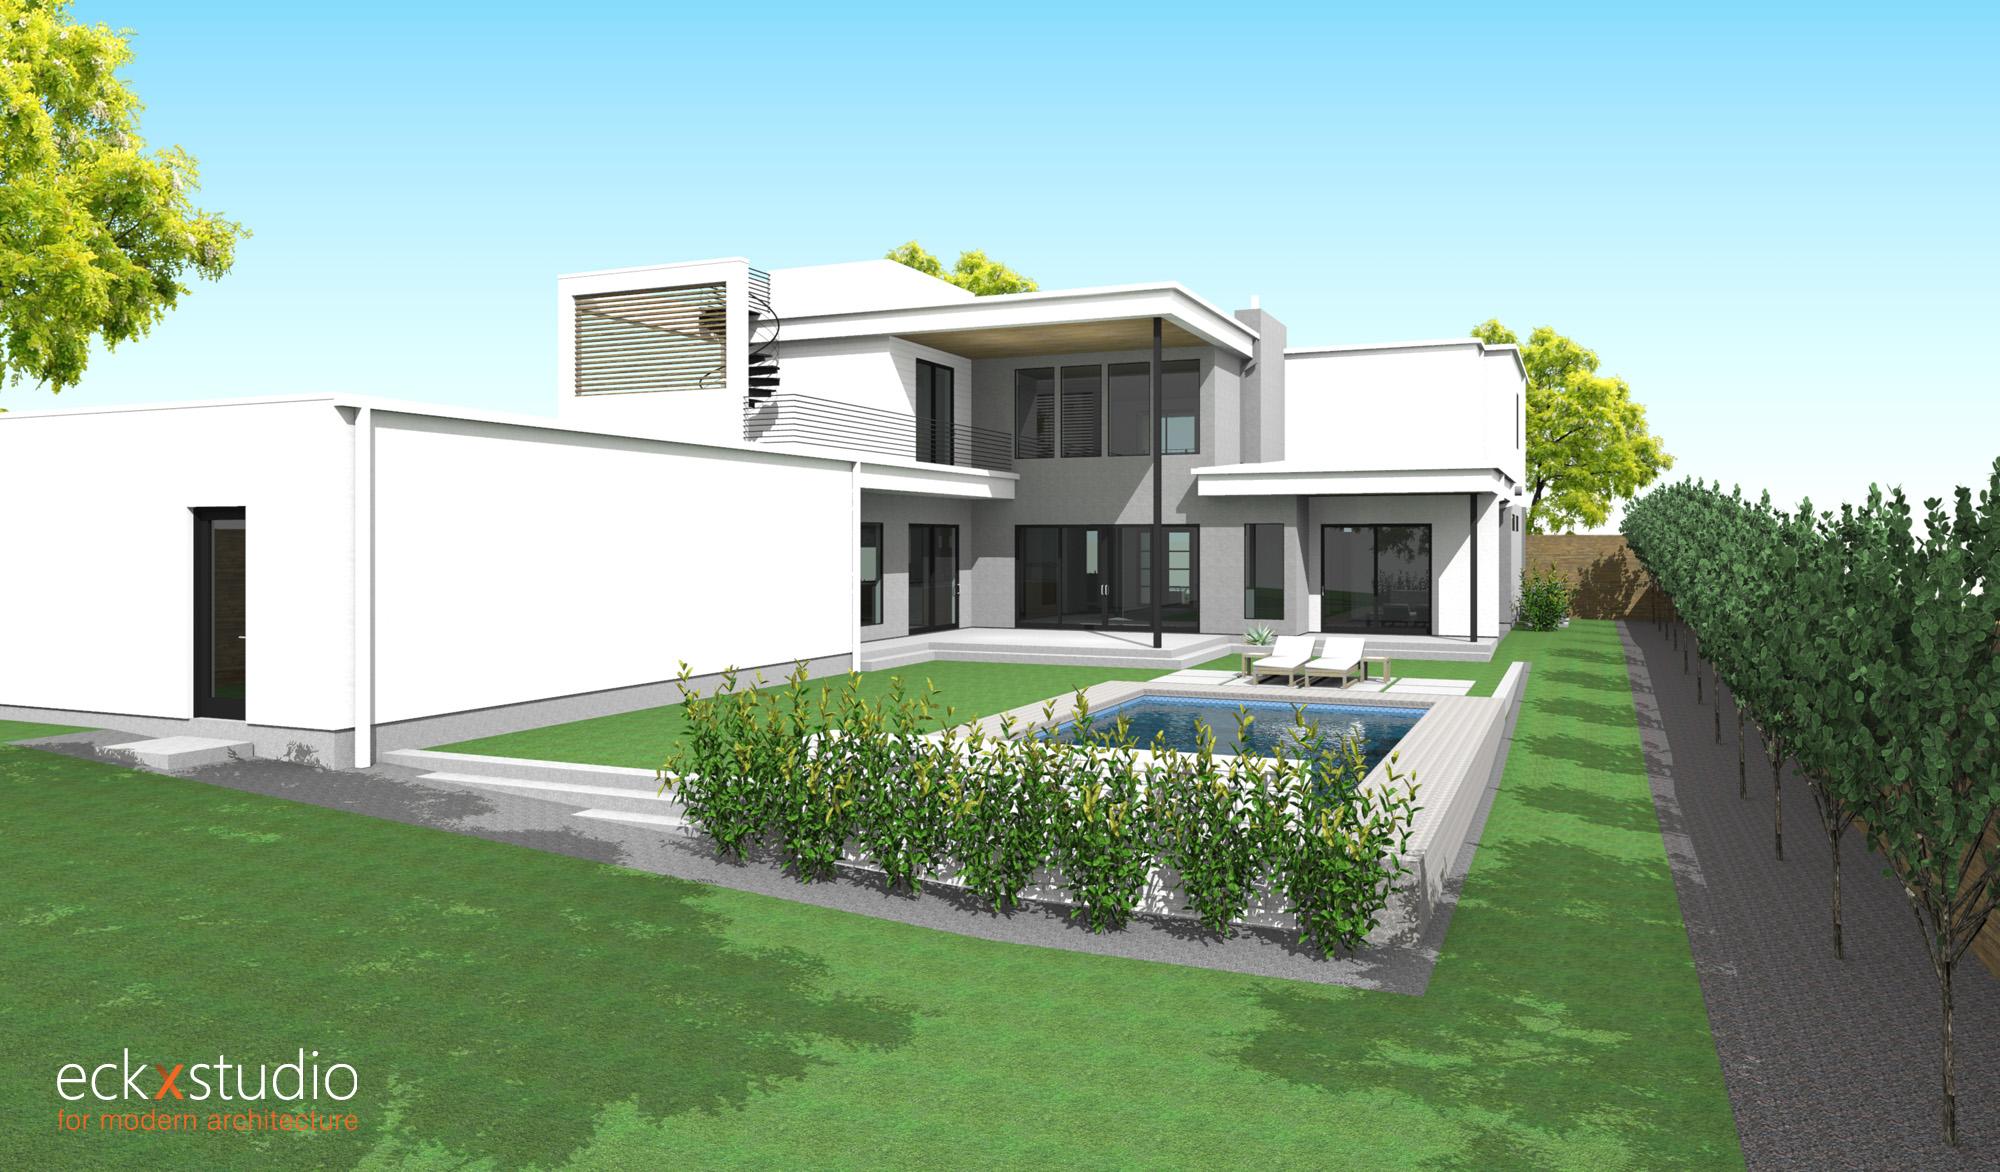 Oriole residence rear elevation image